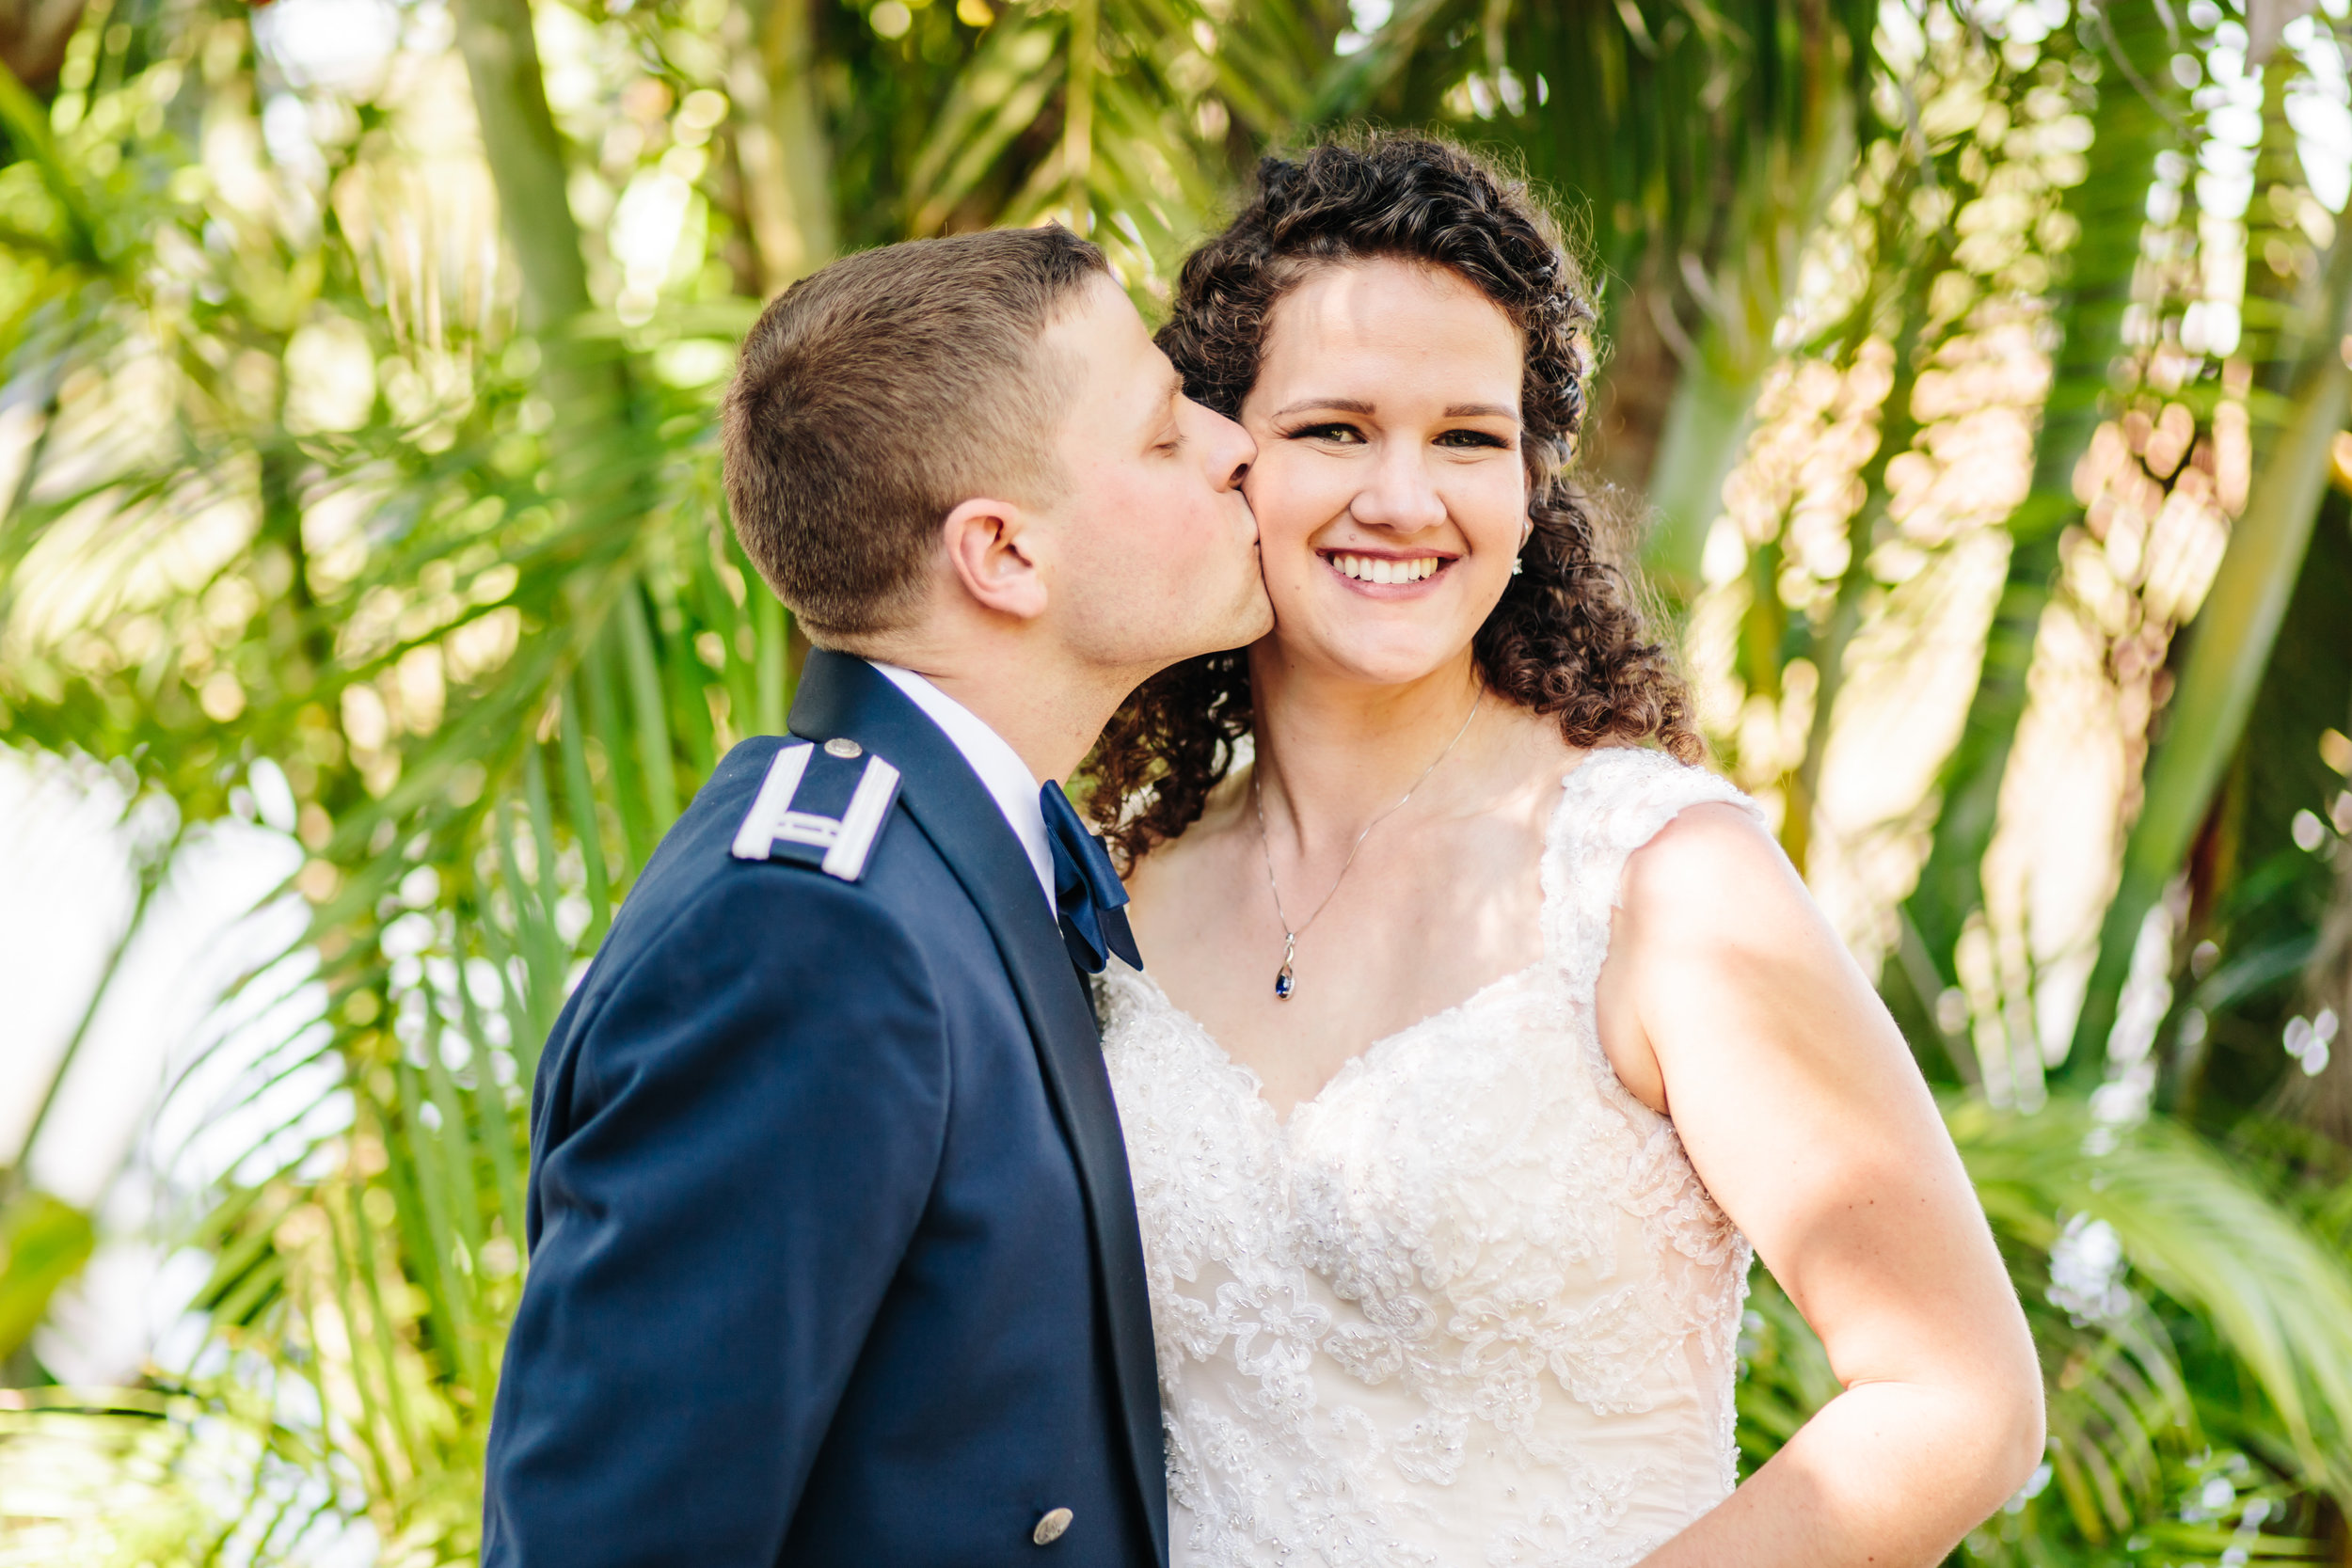 2018.03.17 Allison and Chuck Wedding Waelti Melbourne (514 of 569).jpg